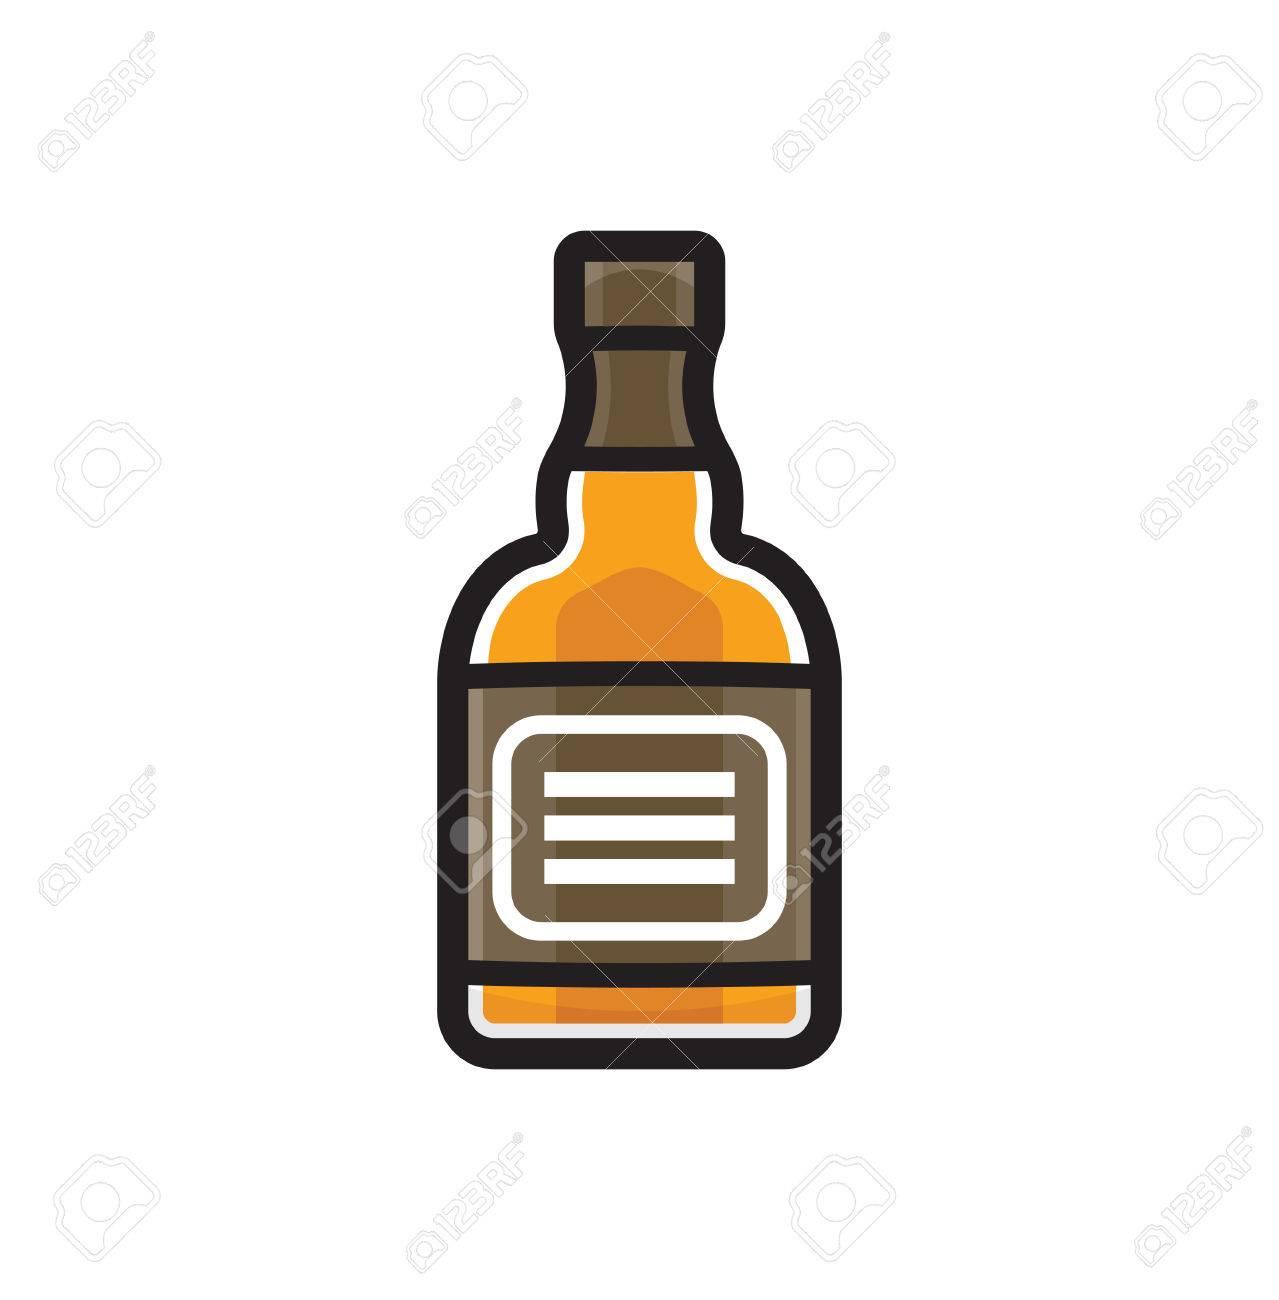 Whiskey bottle clipart 6 » Clipart Station.